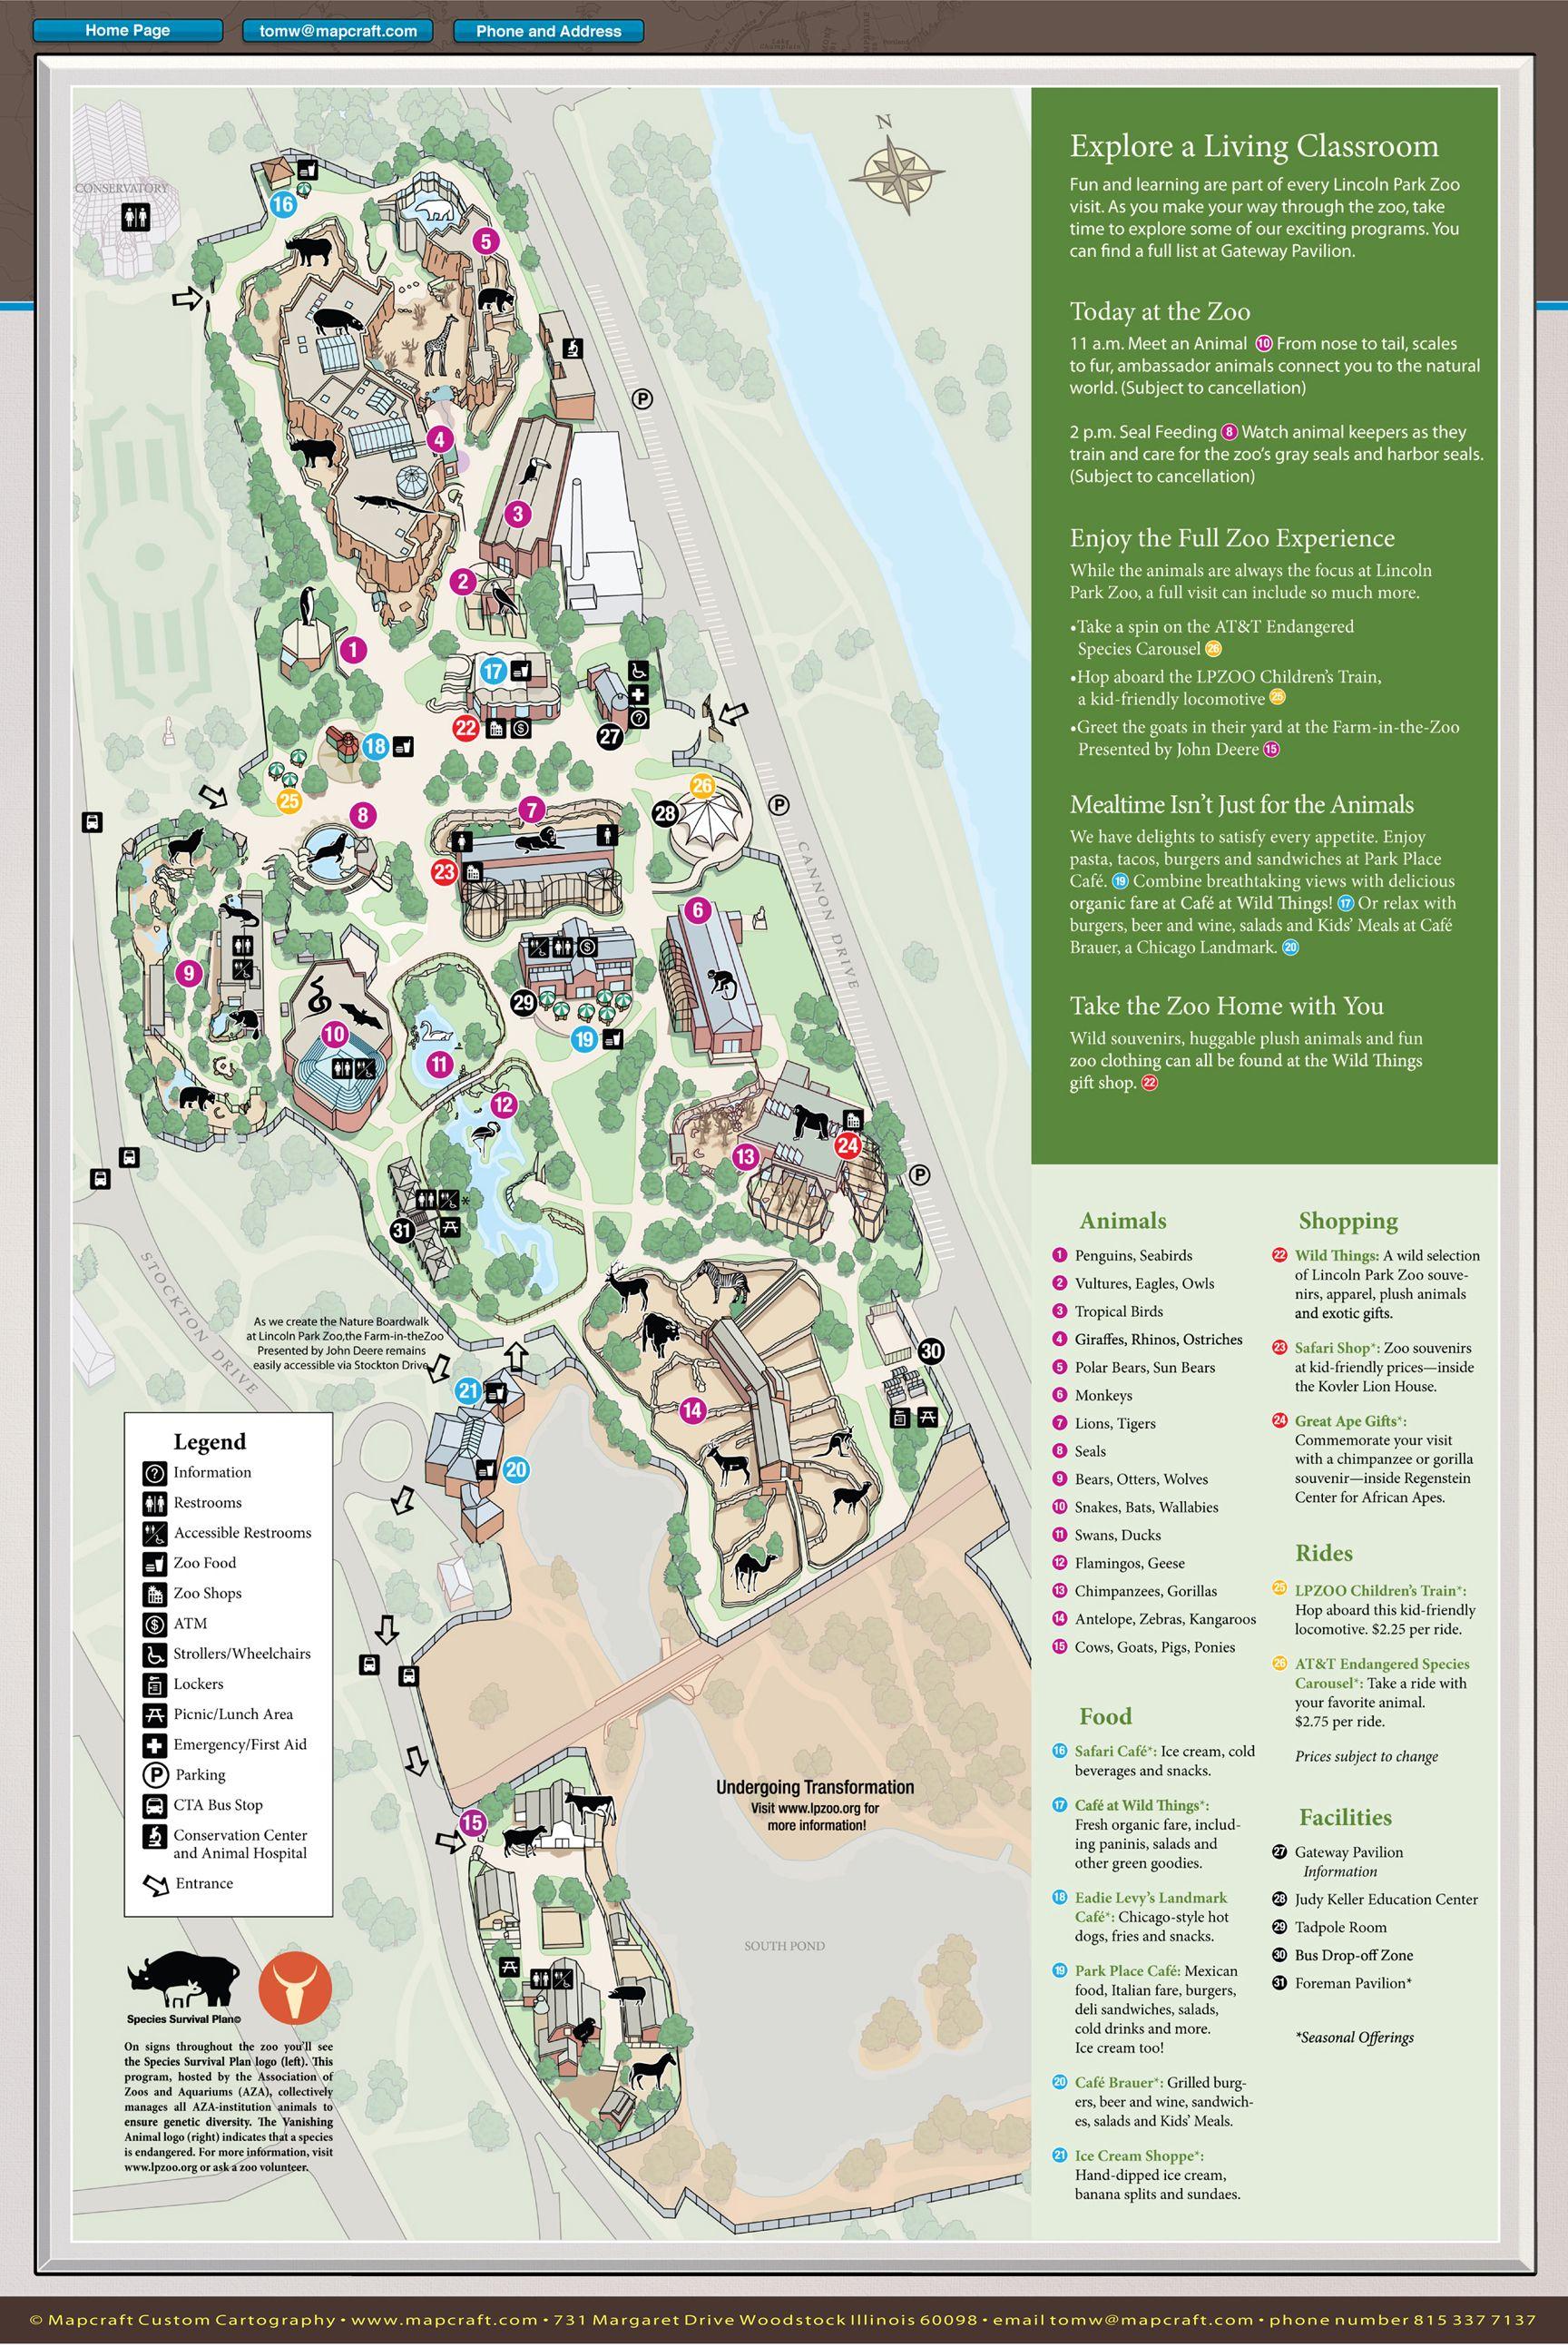 Mapcraft Custom Cartography Lincoln Park Zoo DG 20 Pinterest